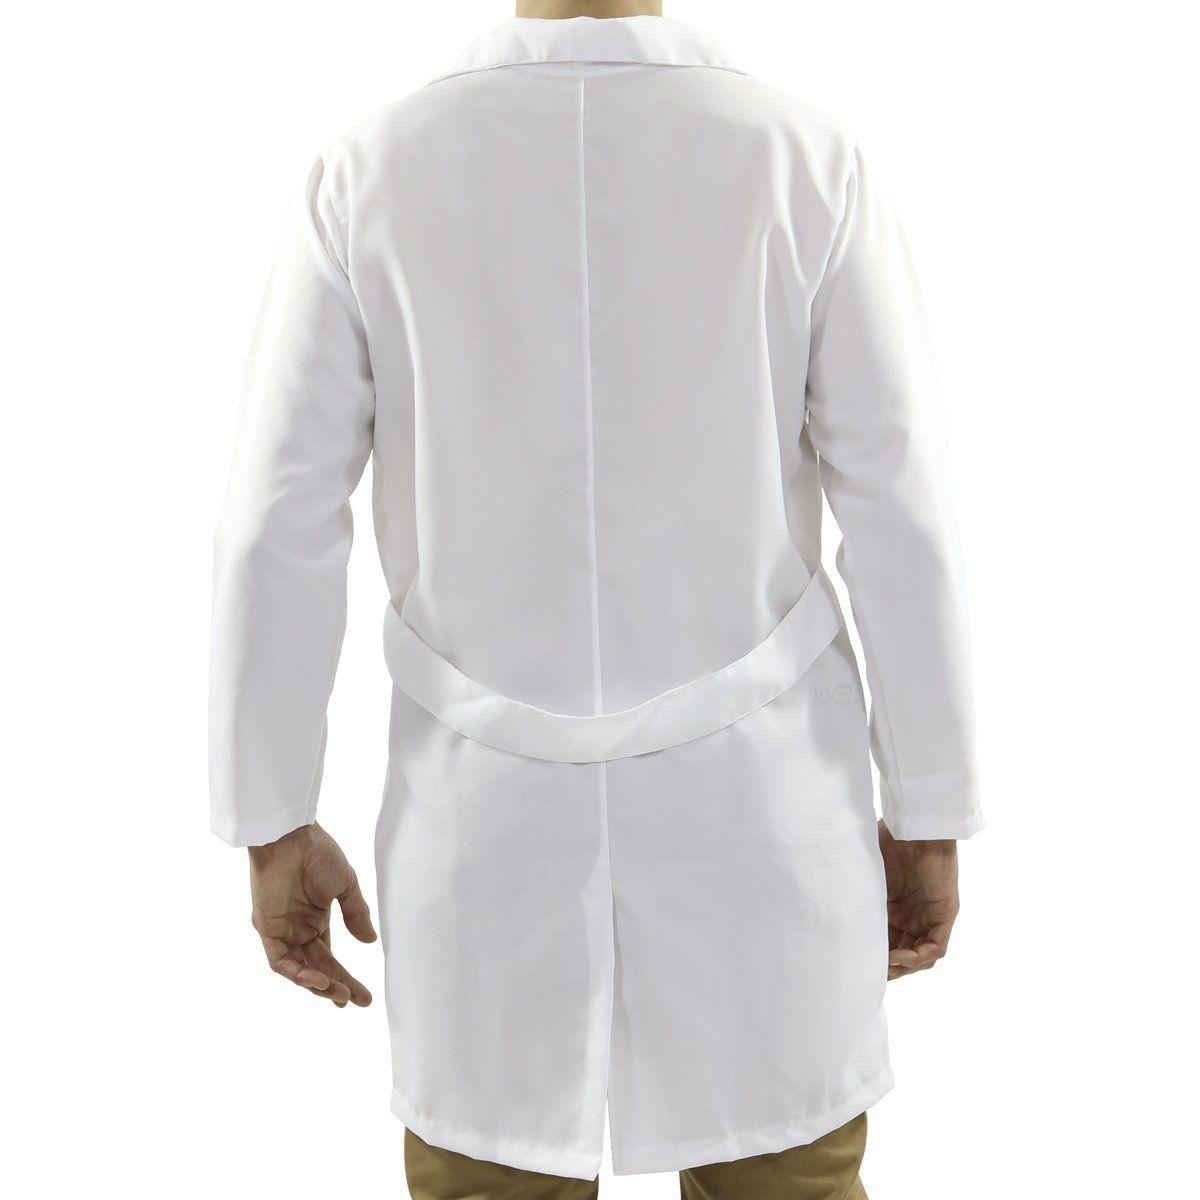 Jaleco Branco tradicional Unissex  Saúde